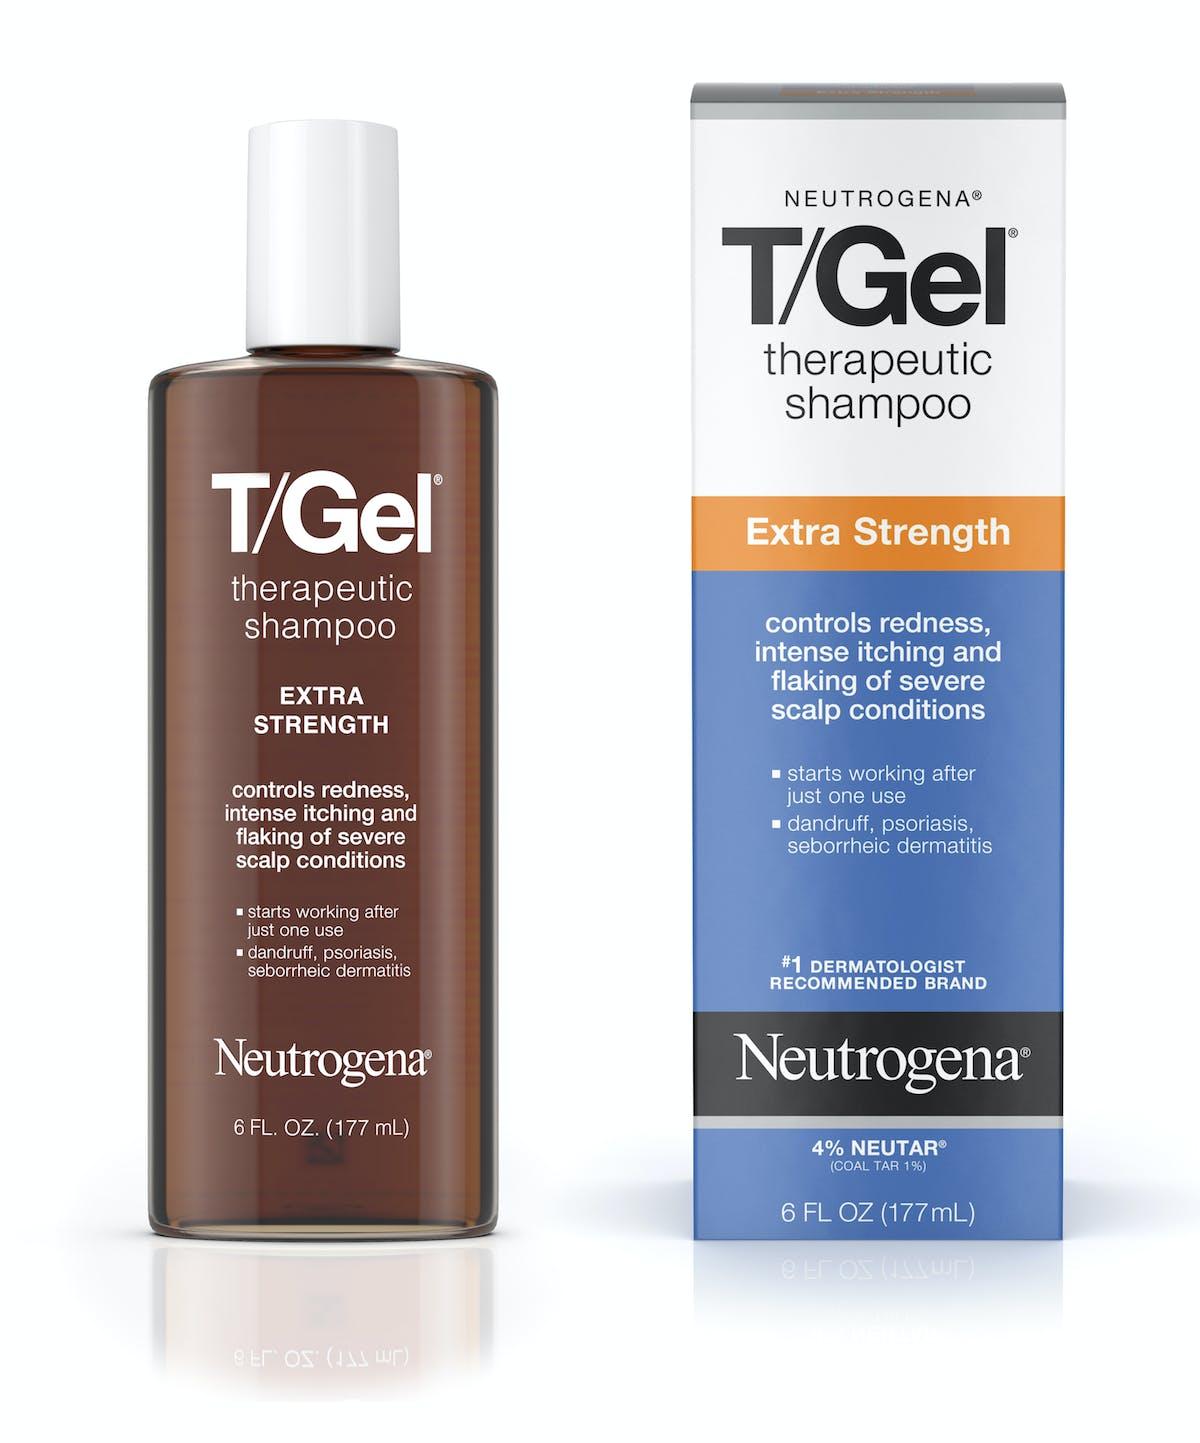 Dandruff Neutrogena Shampoo